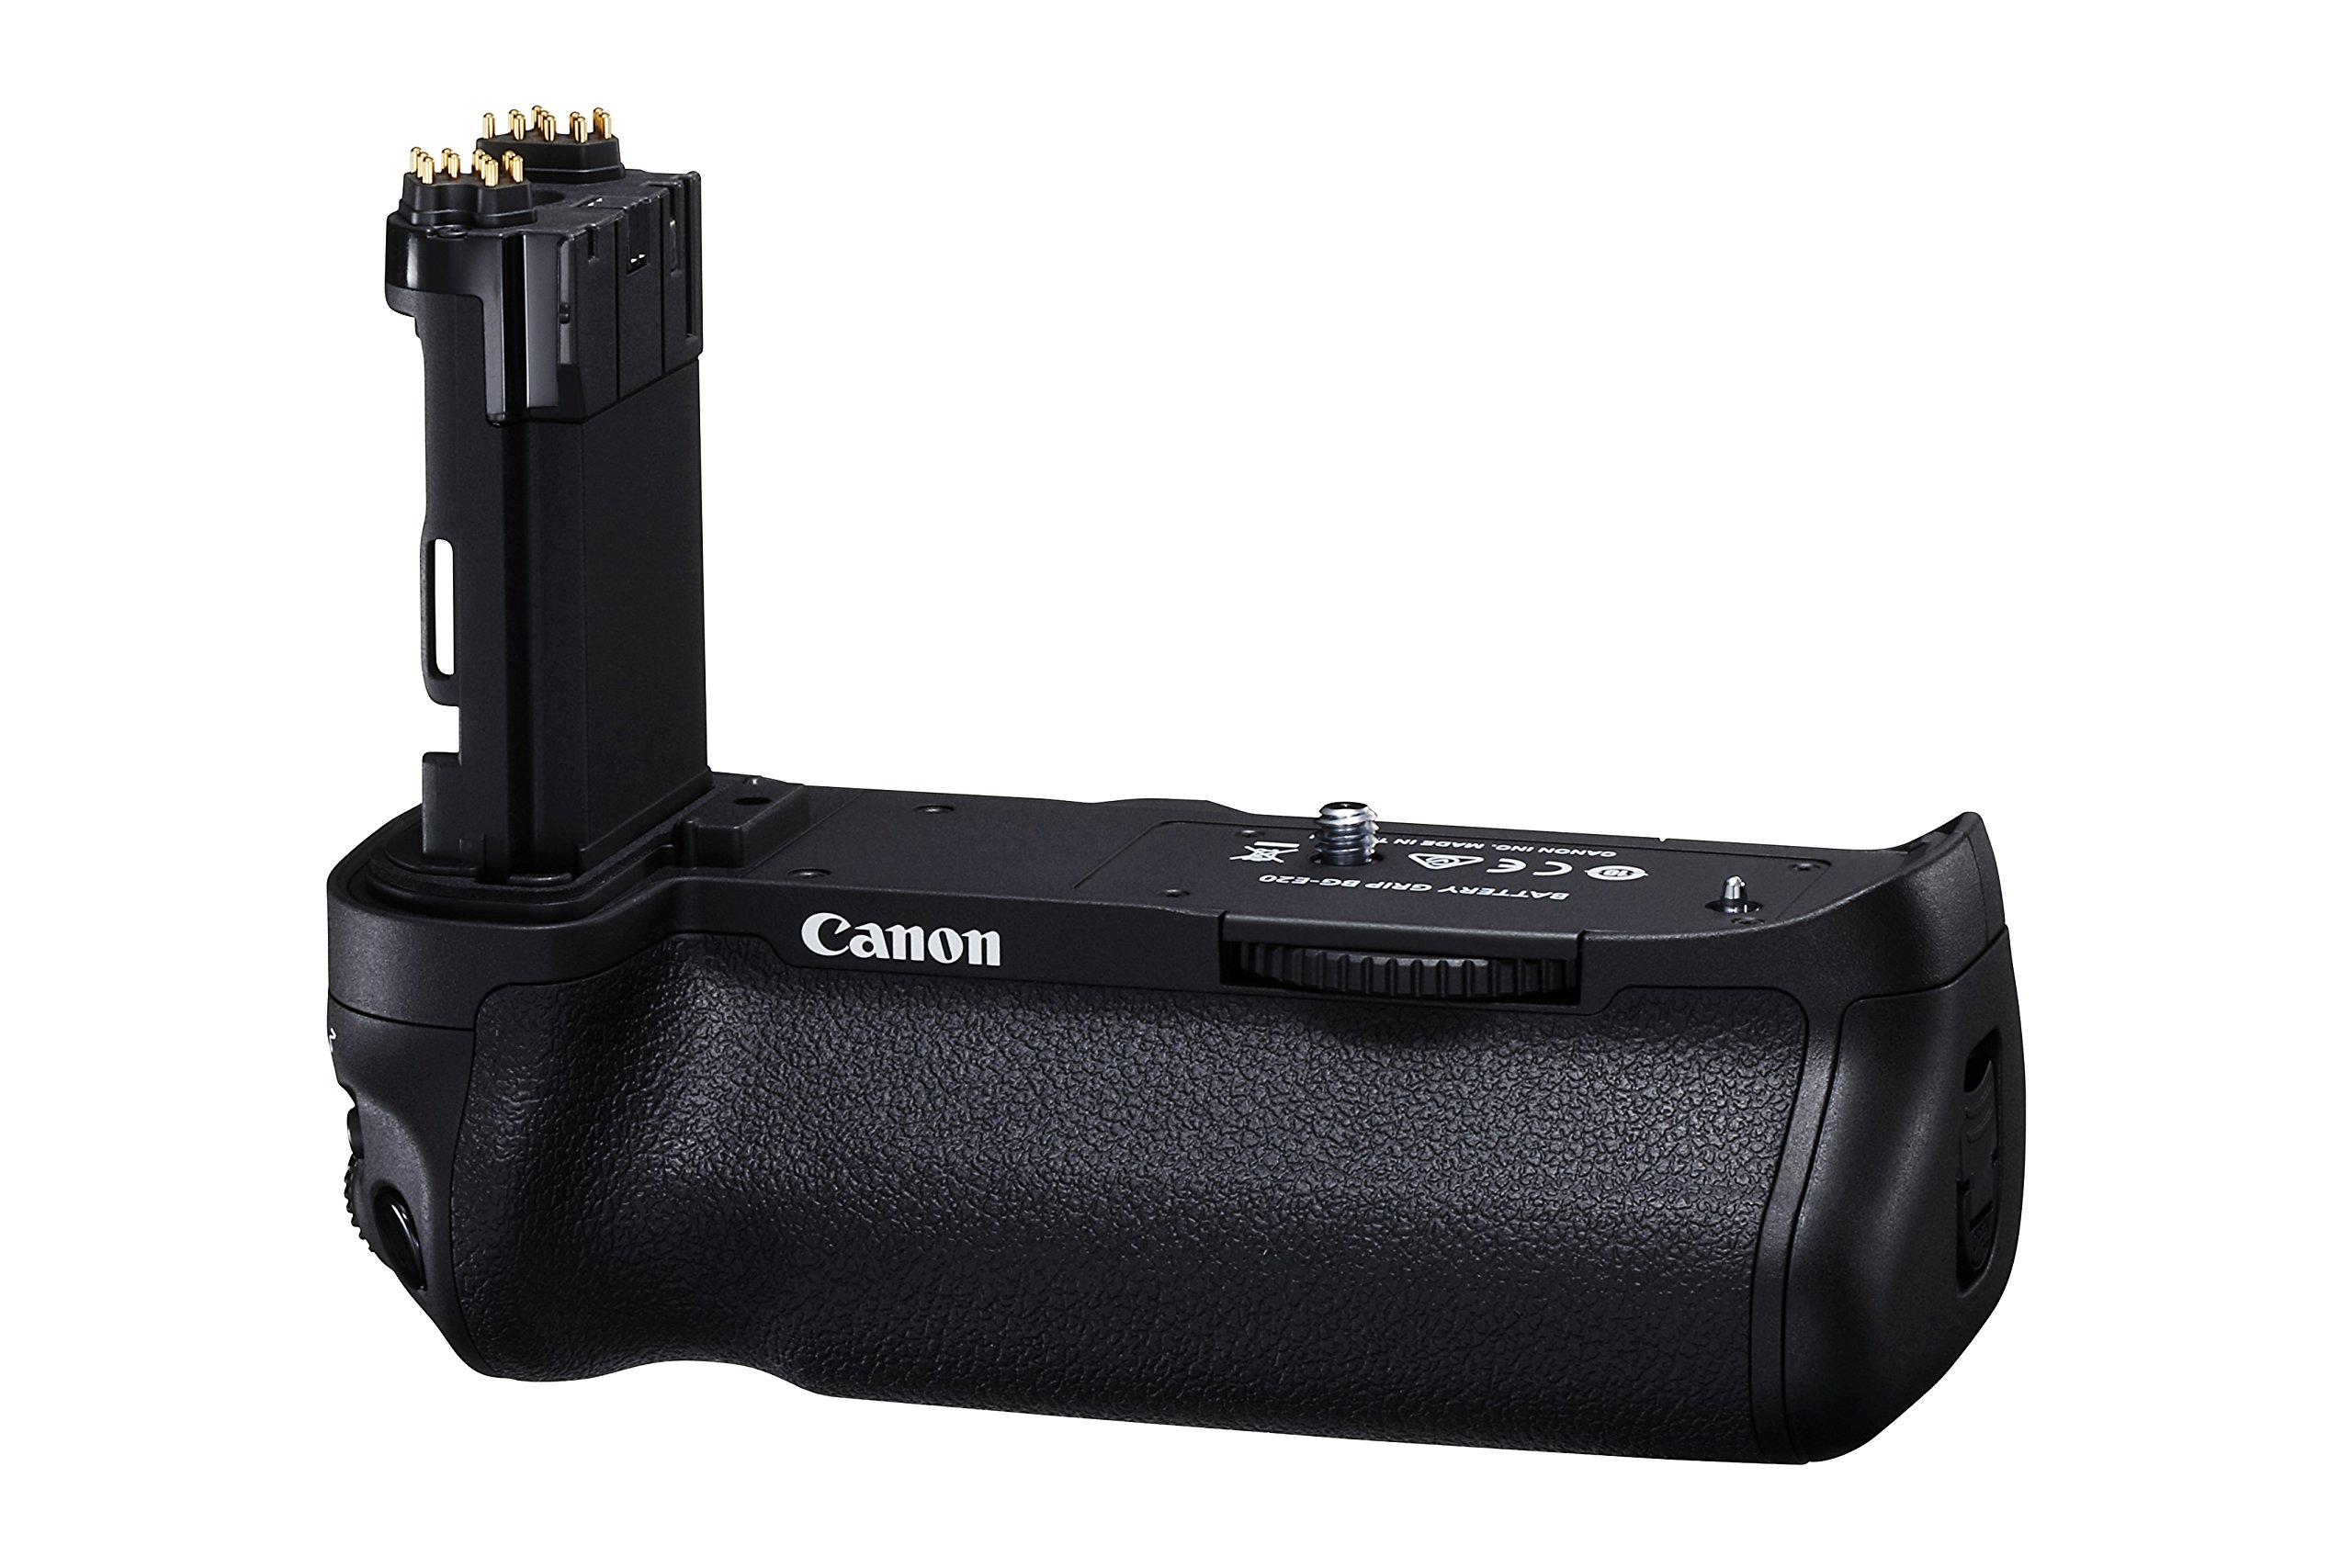 Canon Battery Grip BG-E20 for the Canon 5D Mark IV Digital SLR Camera by Canon